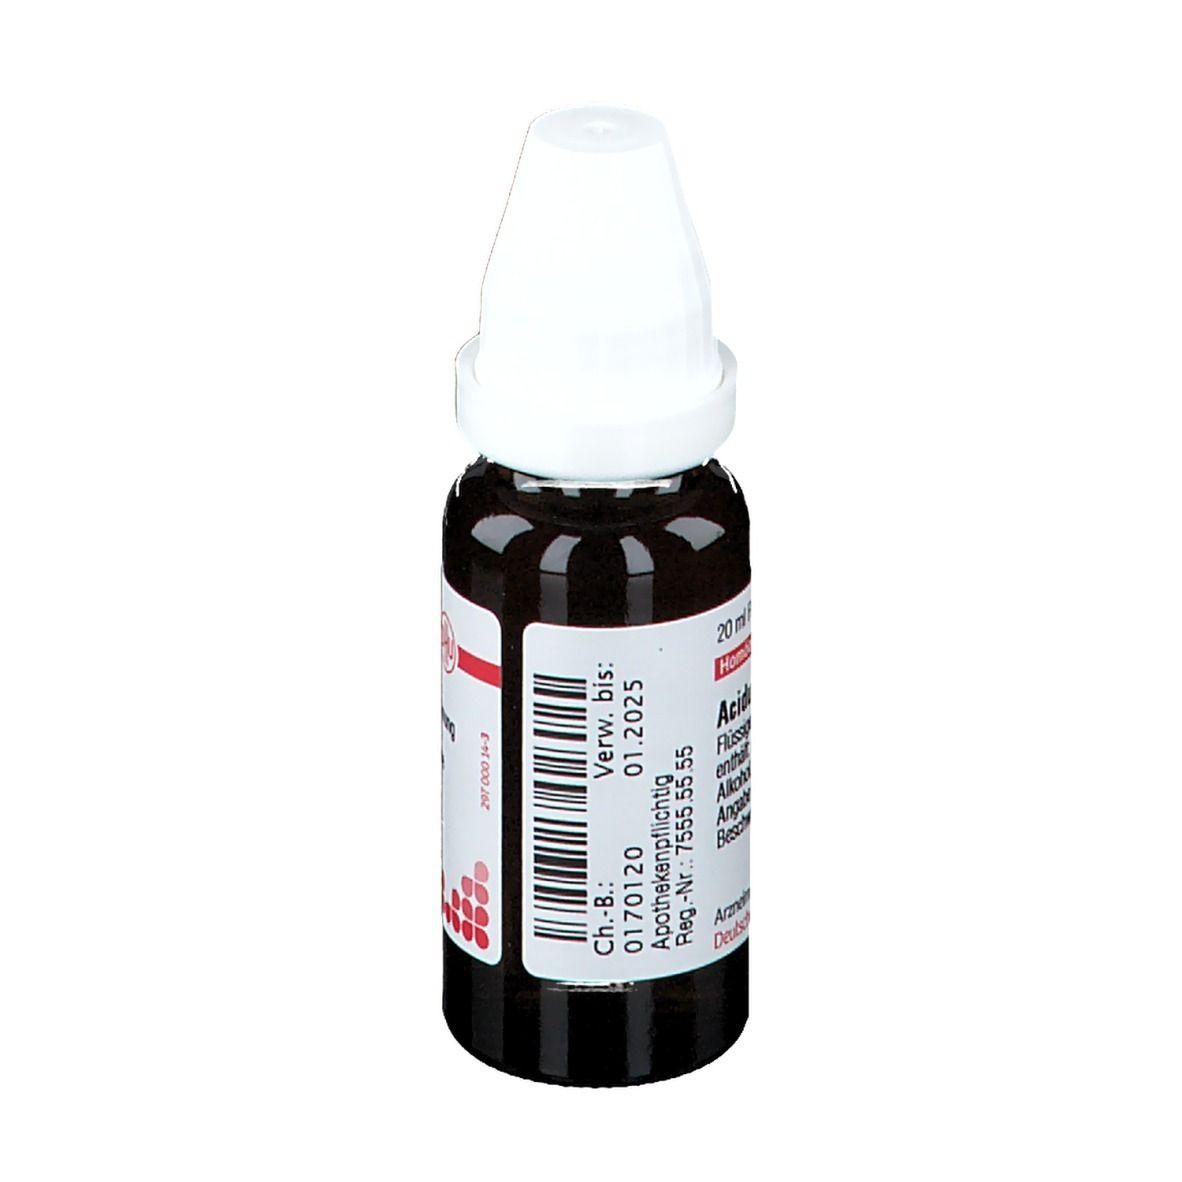 DHU Acidum Phosphoricum D4